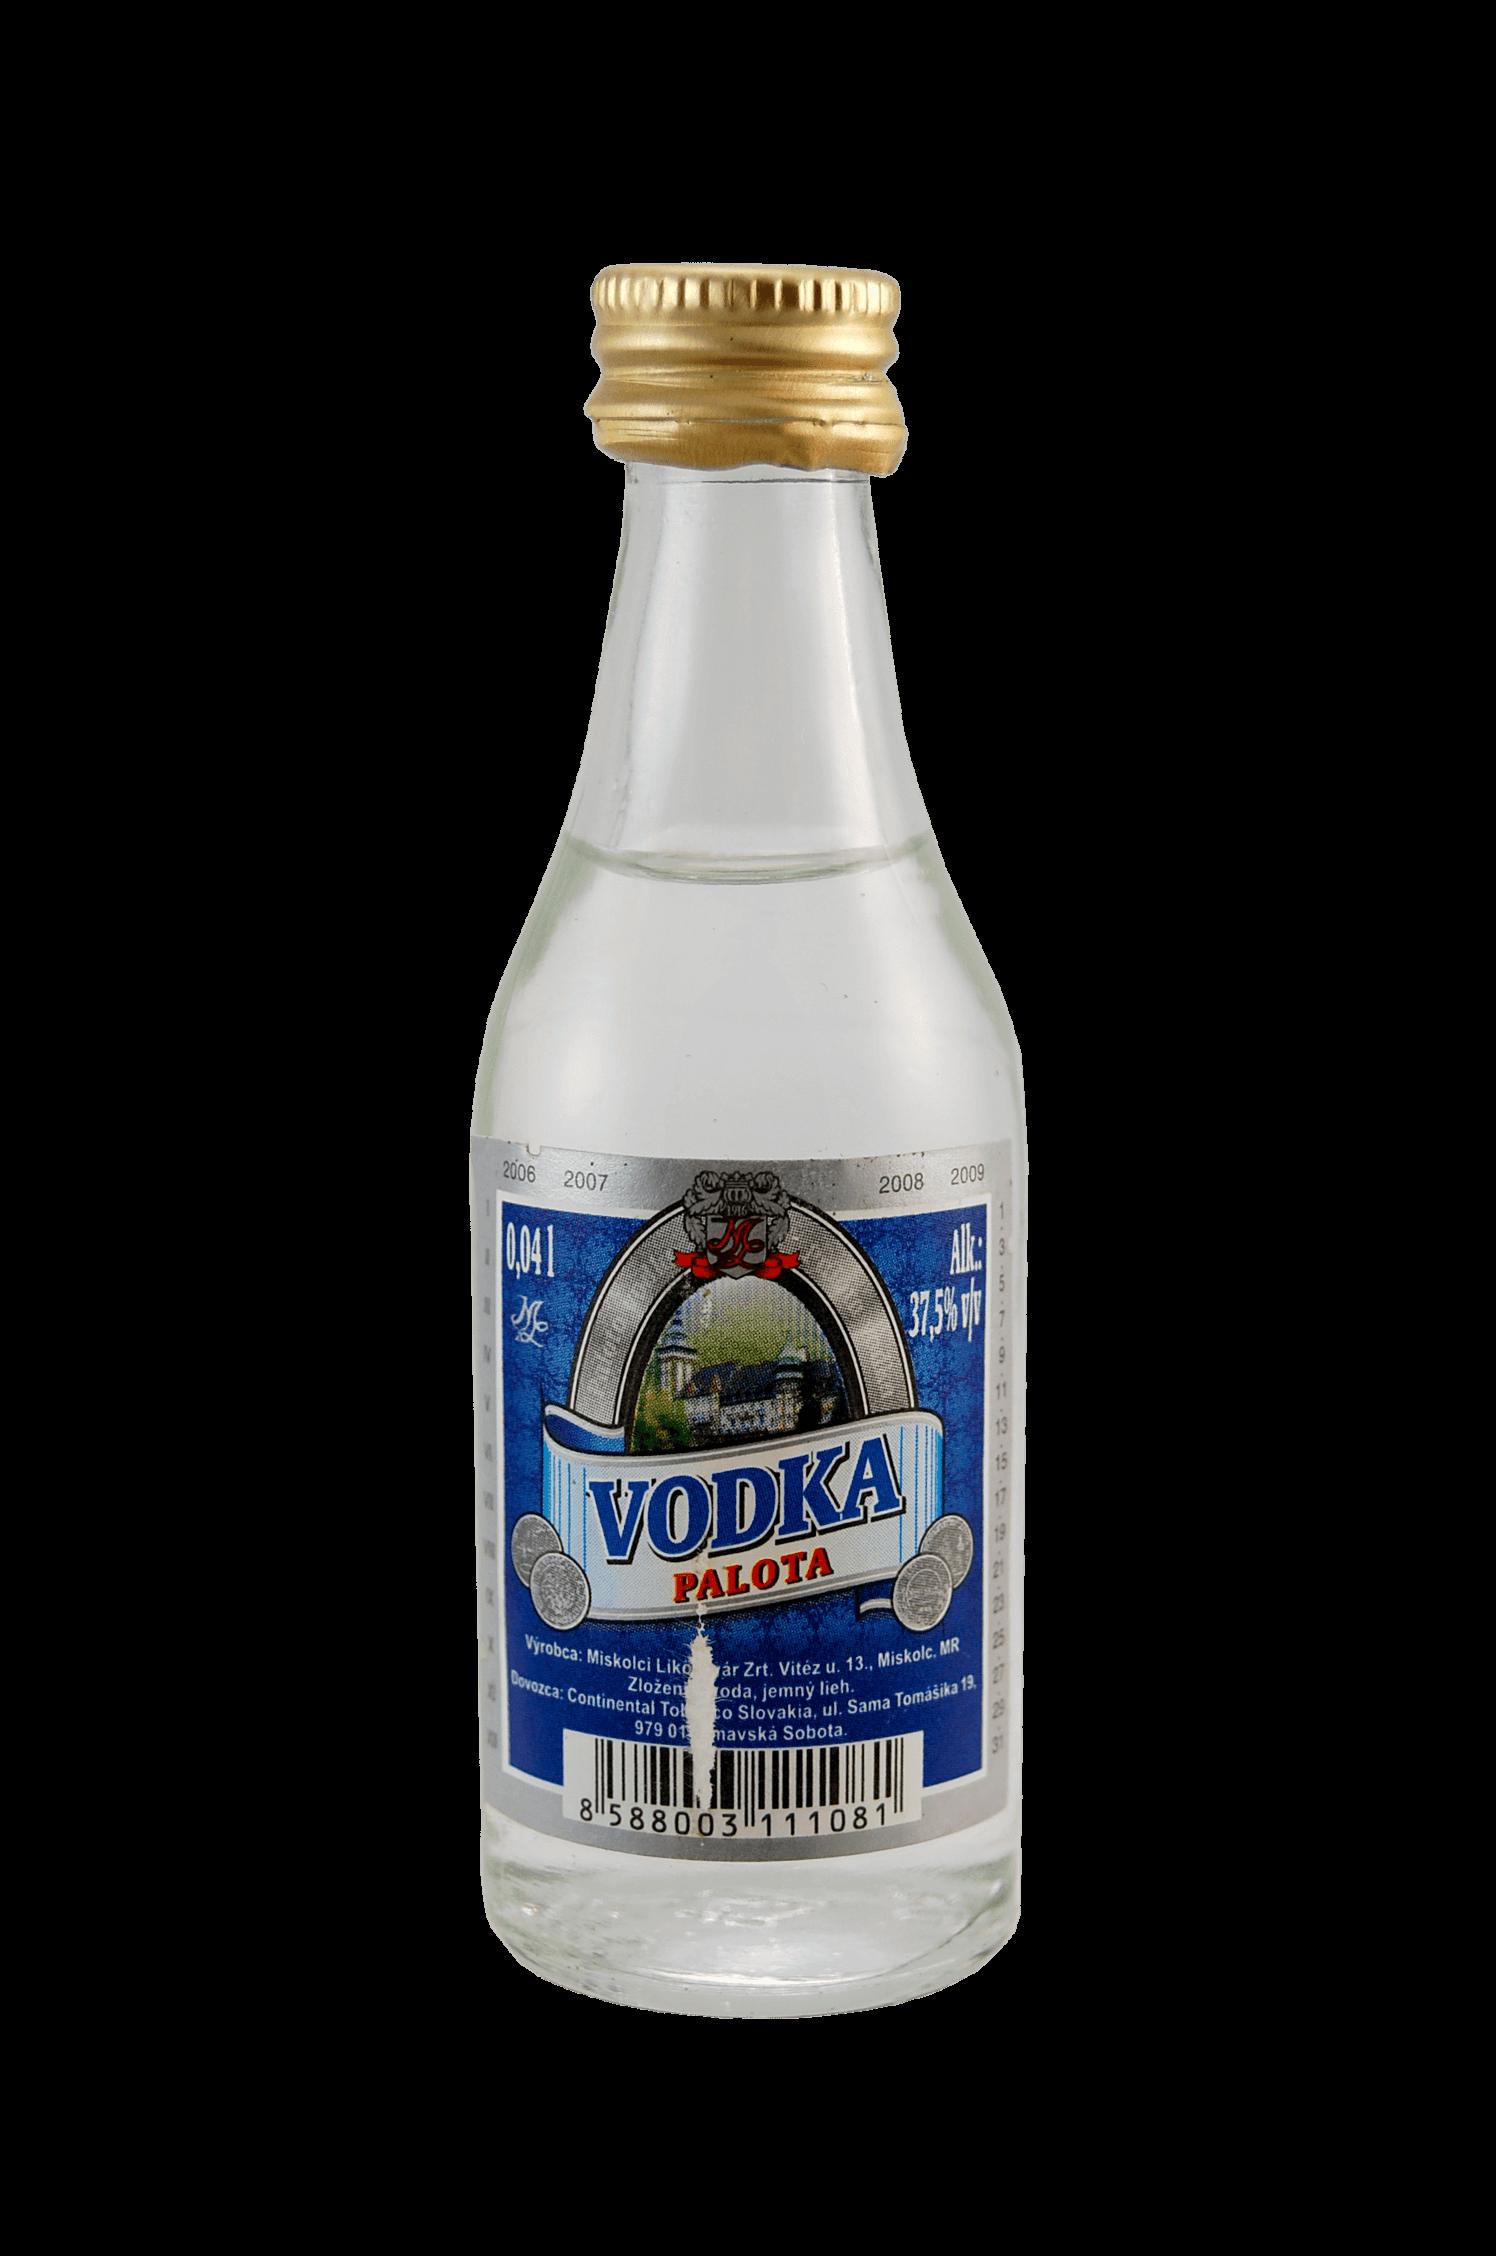 Vodka Palota